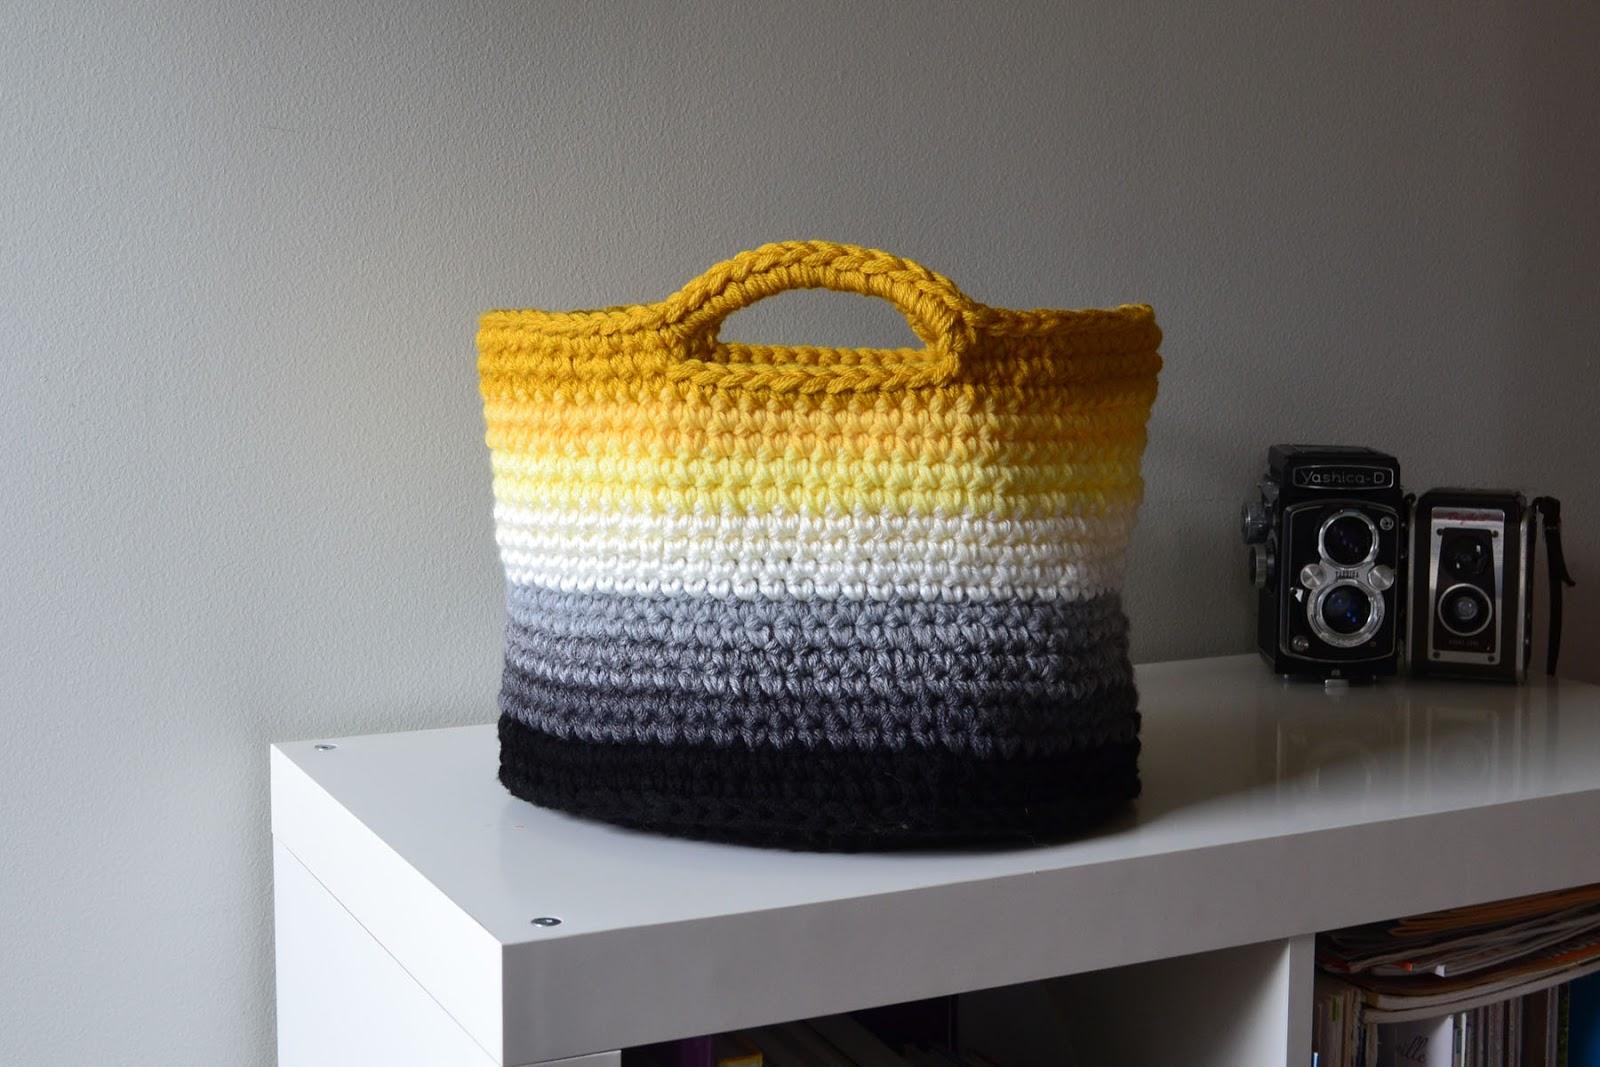 Crochet in Color: Ombre Basket Pattern